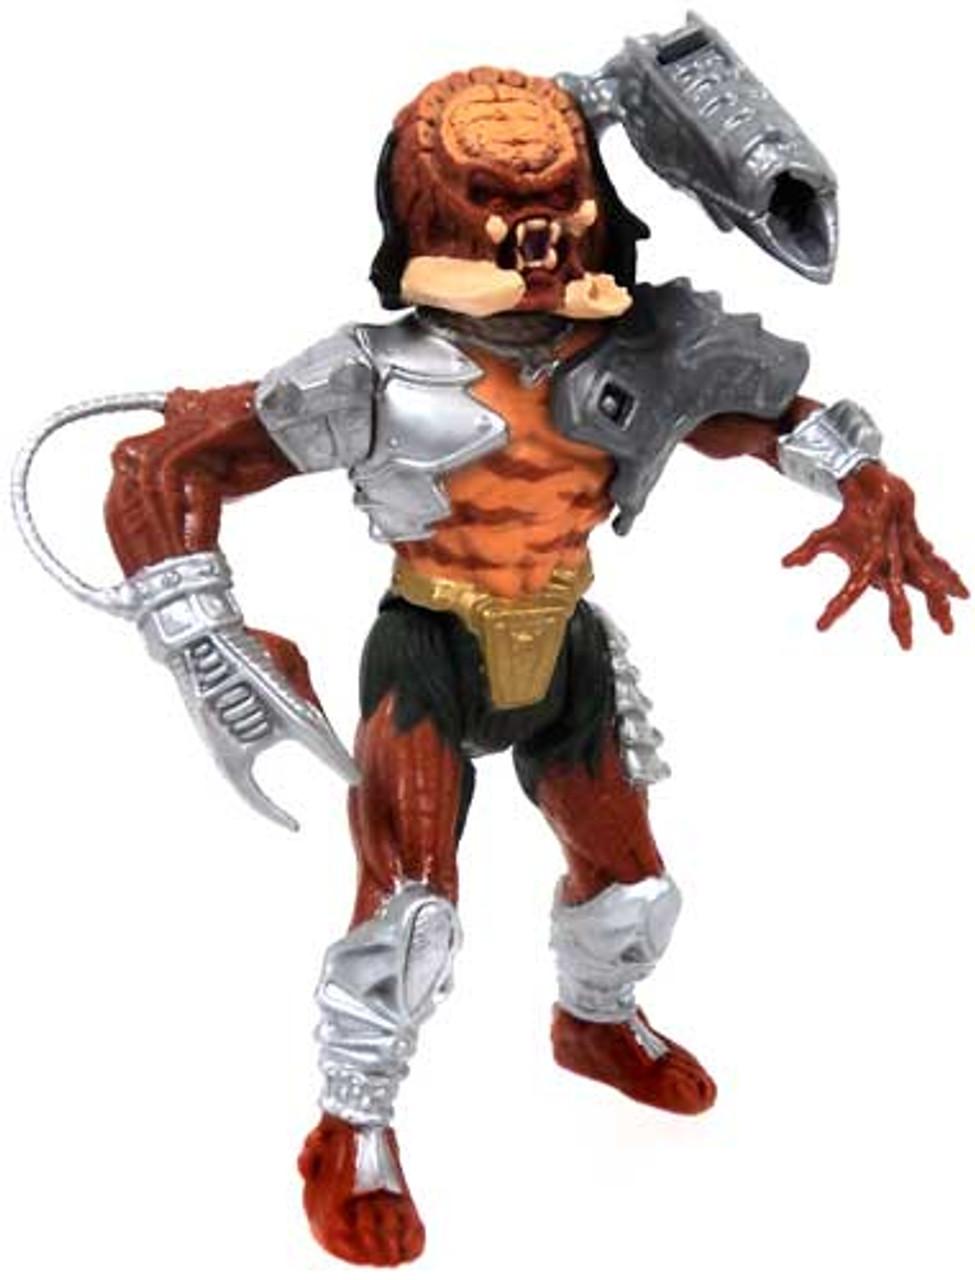 Predator Cracked Tusk Action Figure [Loose]